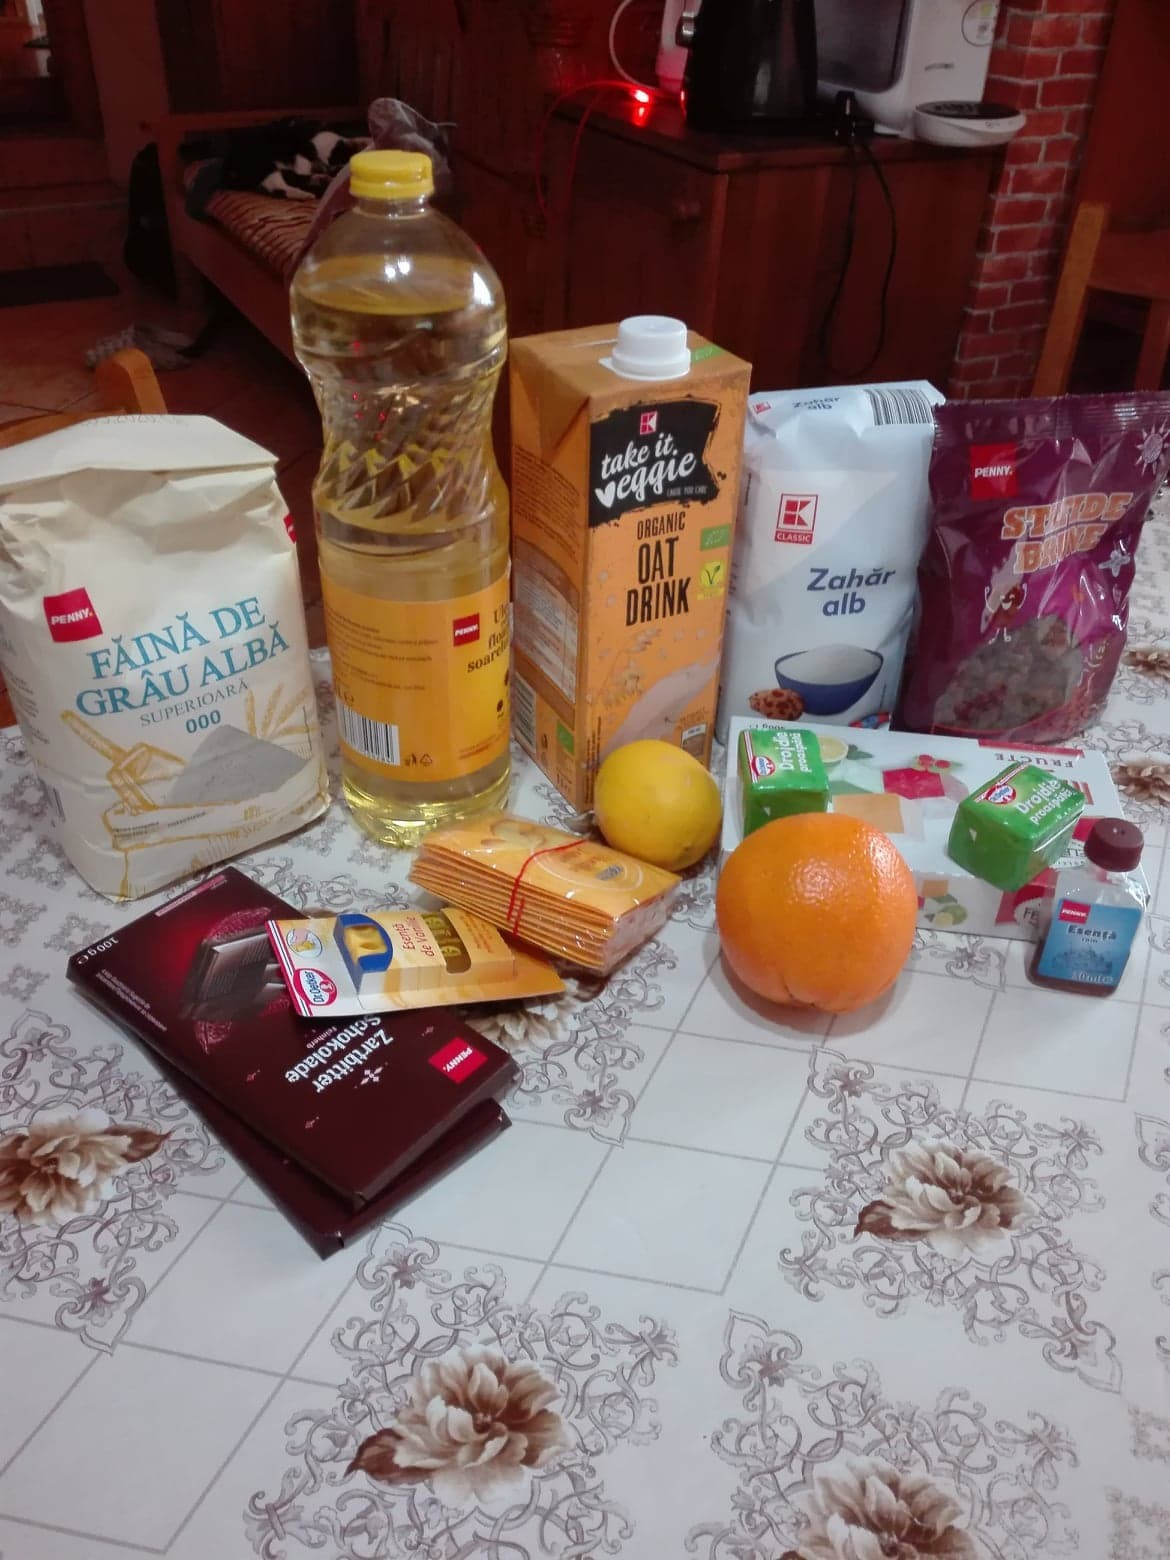 the-traditional-romanian-sweet-cozonac-e